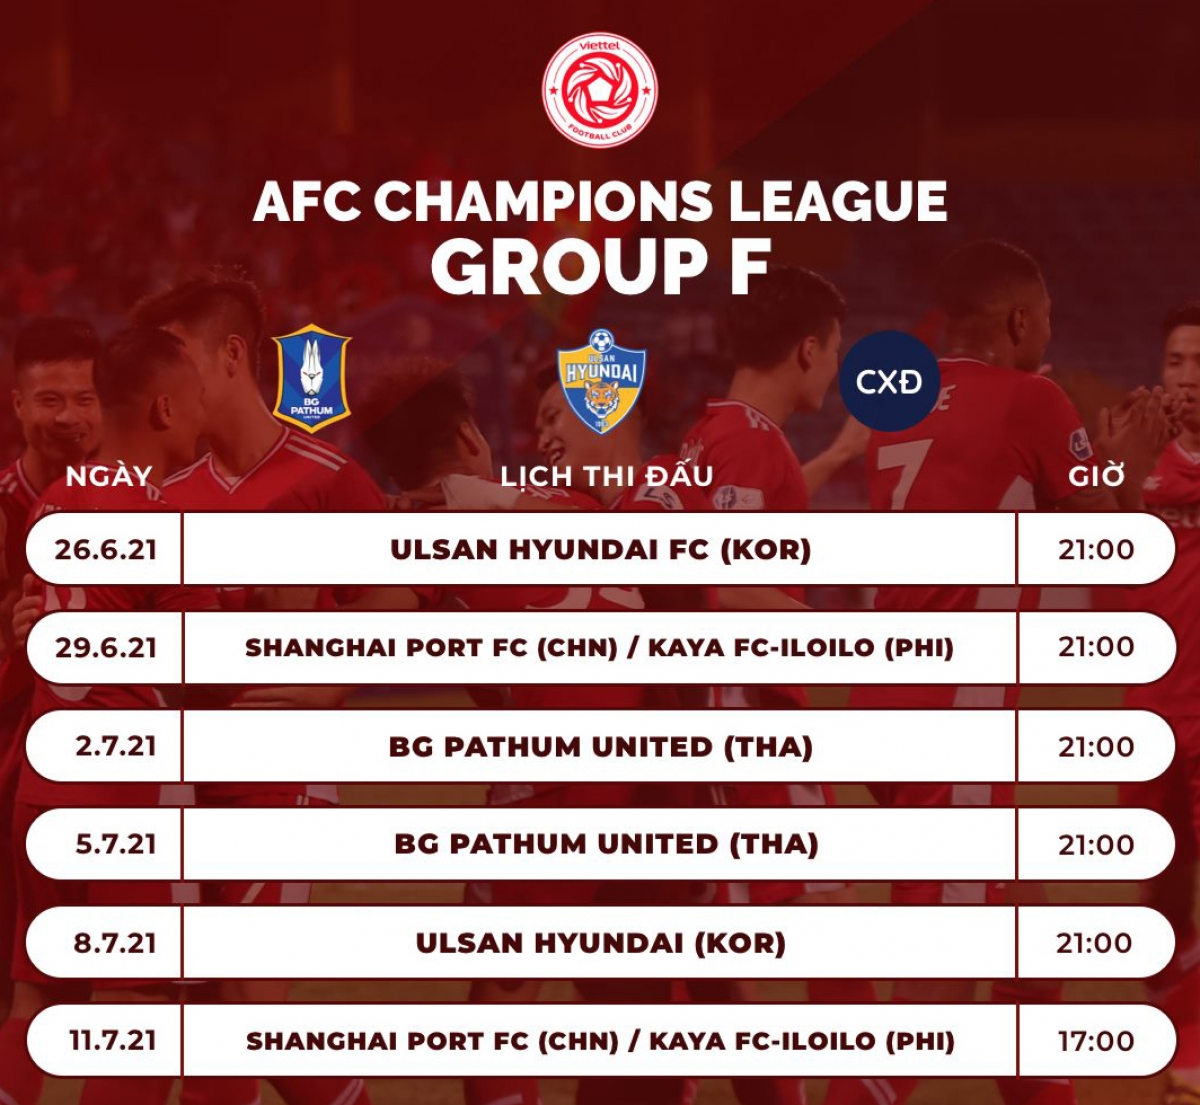 Lịch thi đấu của Viettel ở AFC Champions League 2021.